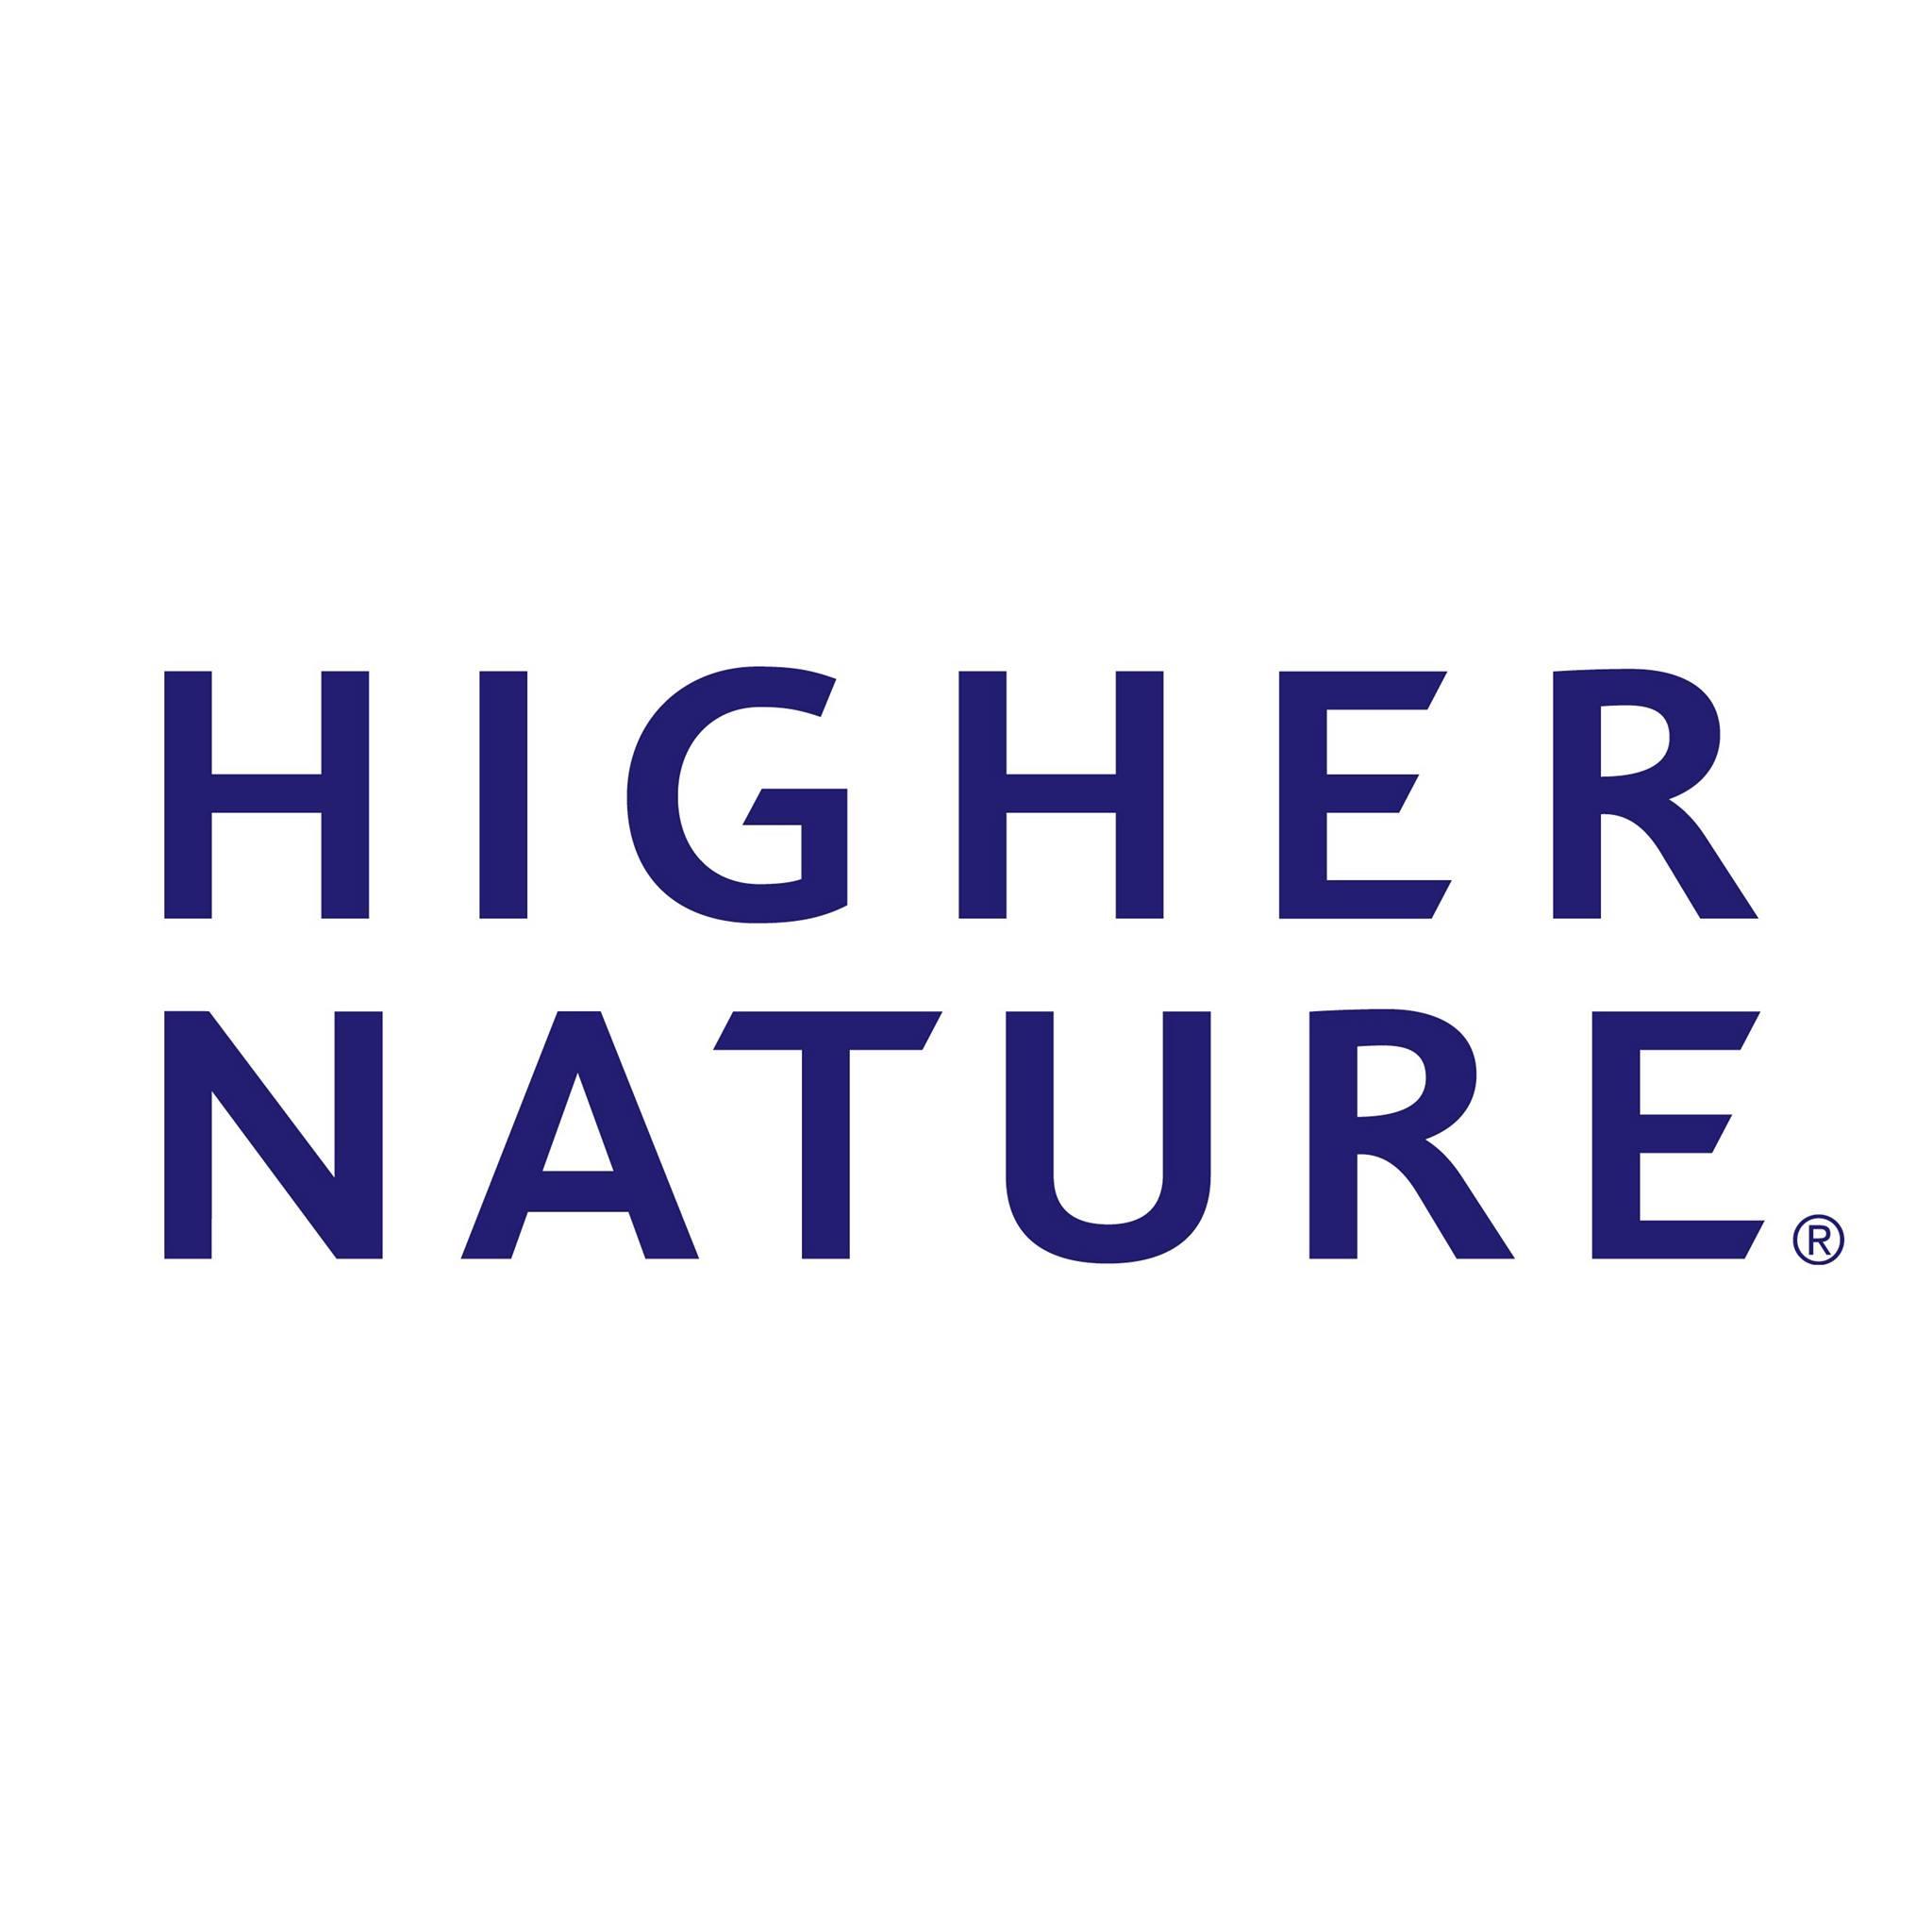 higher-nature-uk-logo